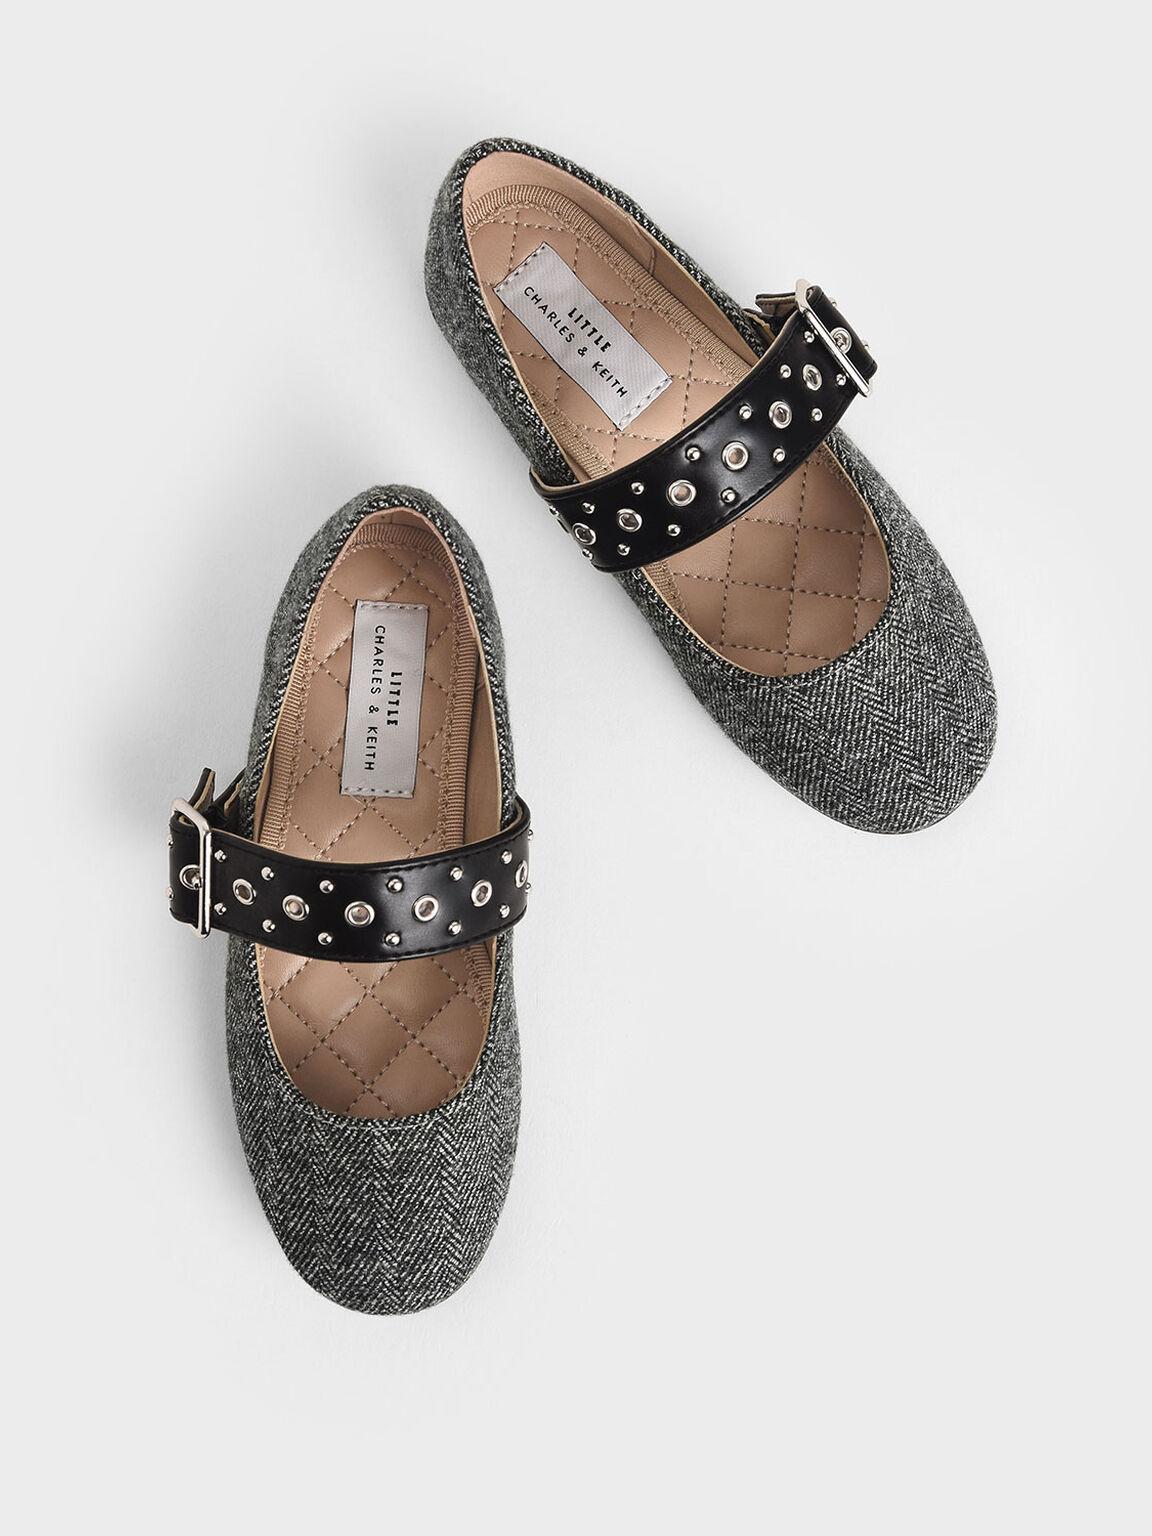 Girls' Woven Fabric Studded Mary Jane Flats, Dark Grey, hi-res